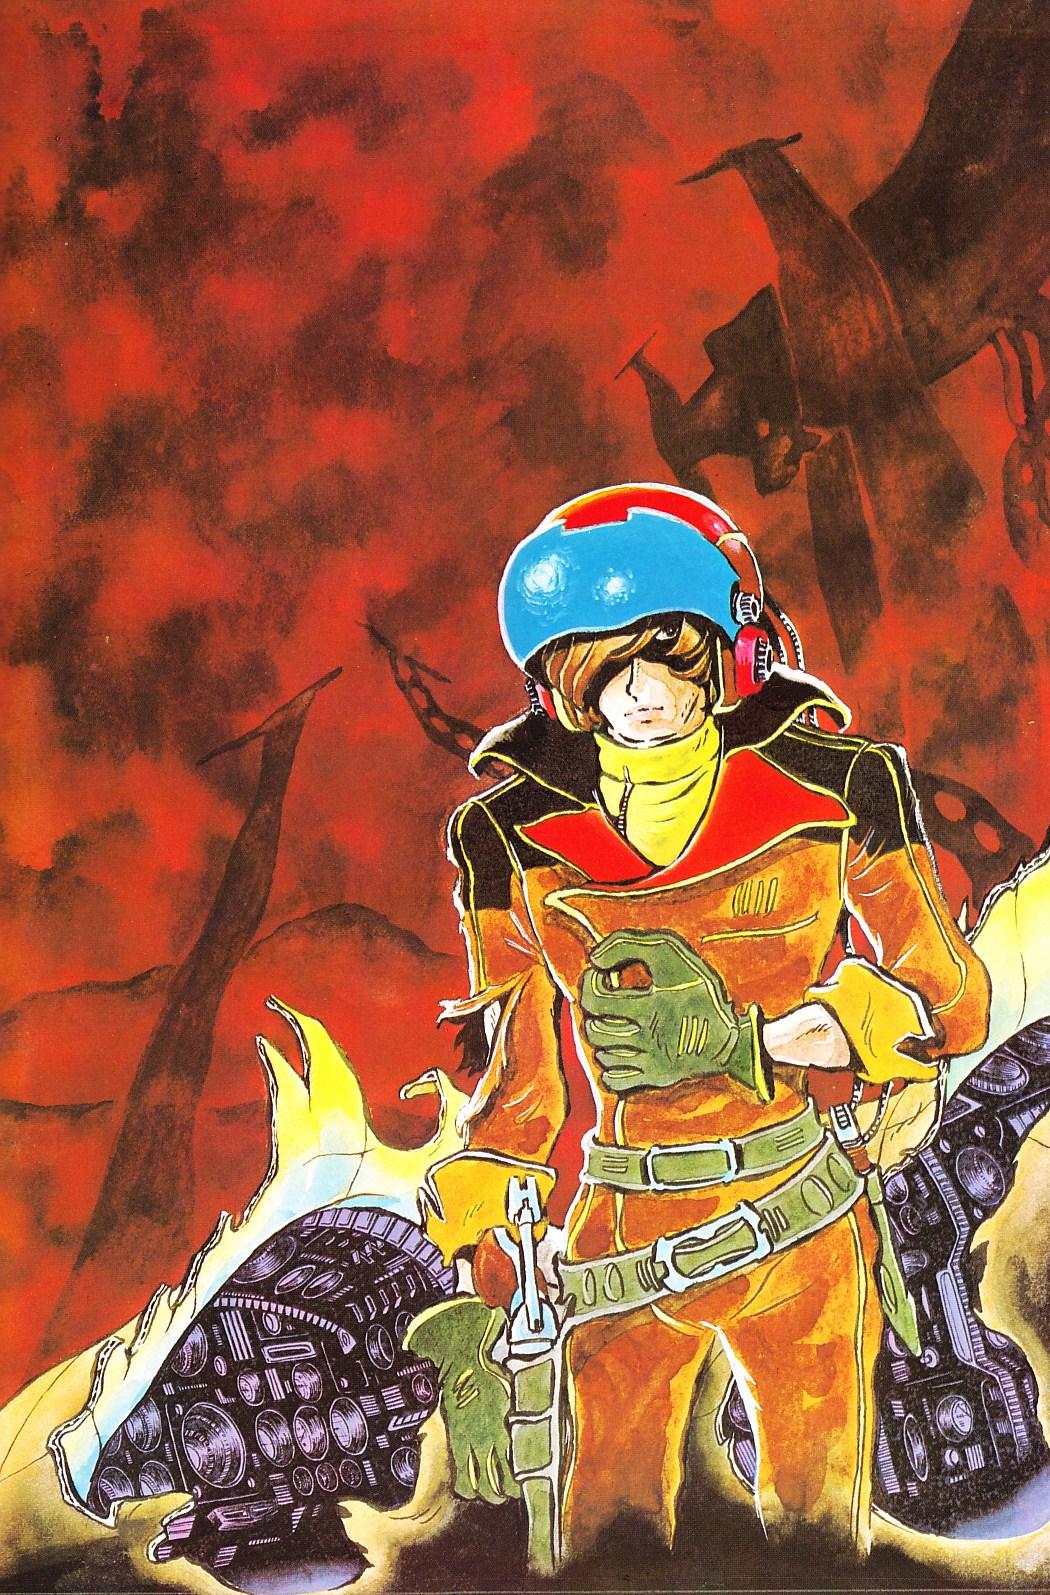 lieji matsumoto animage 1977 1